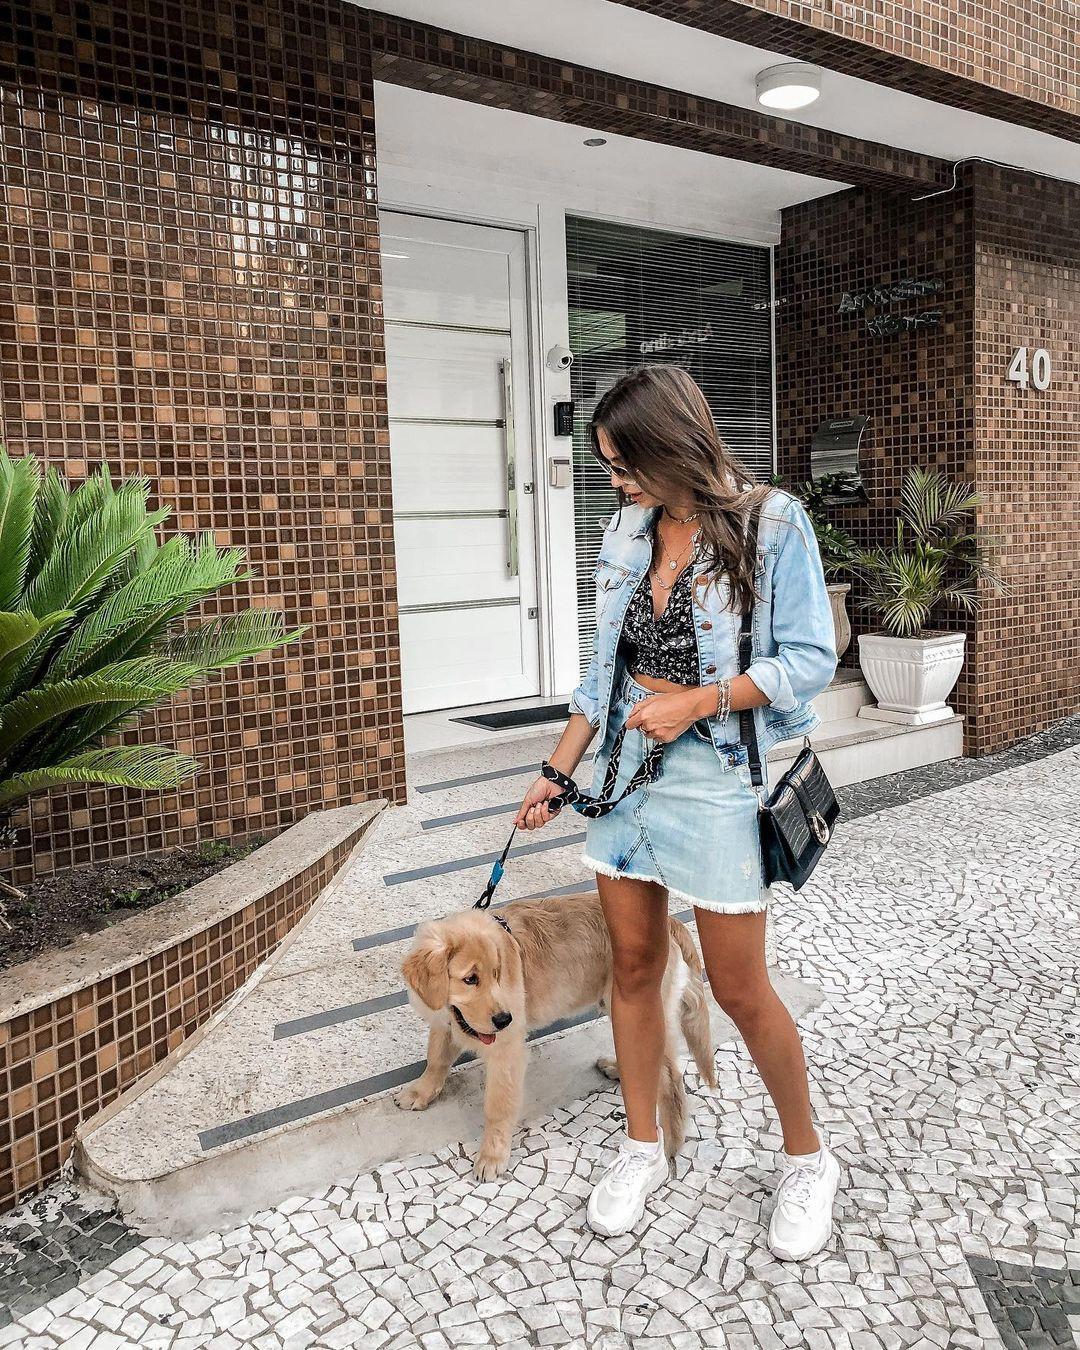 ana flavia giacomini, miss ilha dos lobos mundo 2019. - Página 3 Fvkkfs10